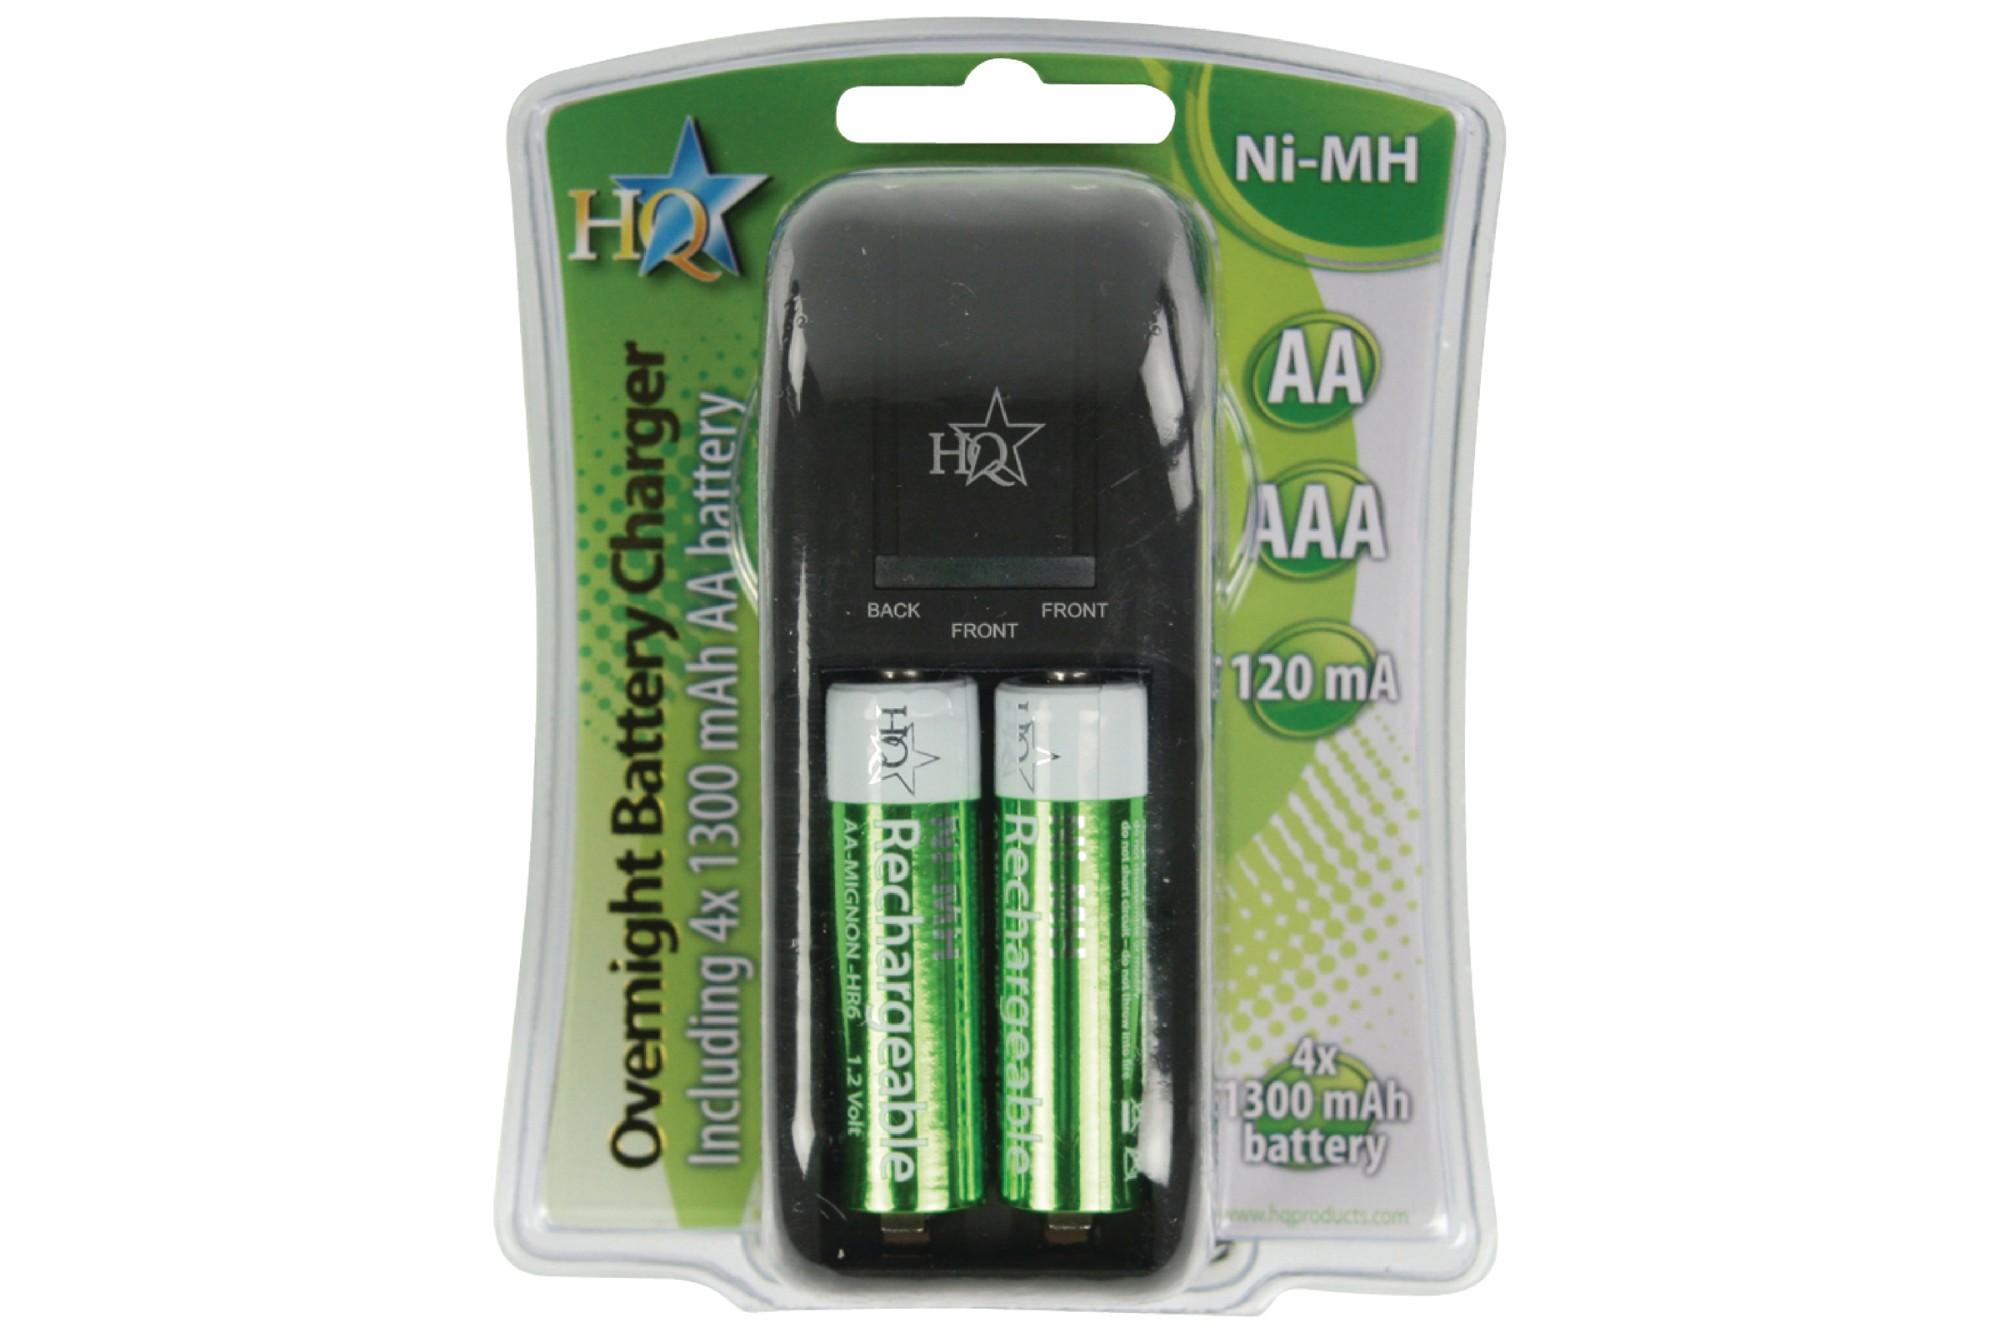 NEDIS HQ Ultra Compact 13amp Battery Charger inc 4xAA 1300mAh Batteries